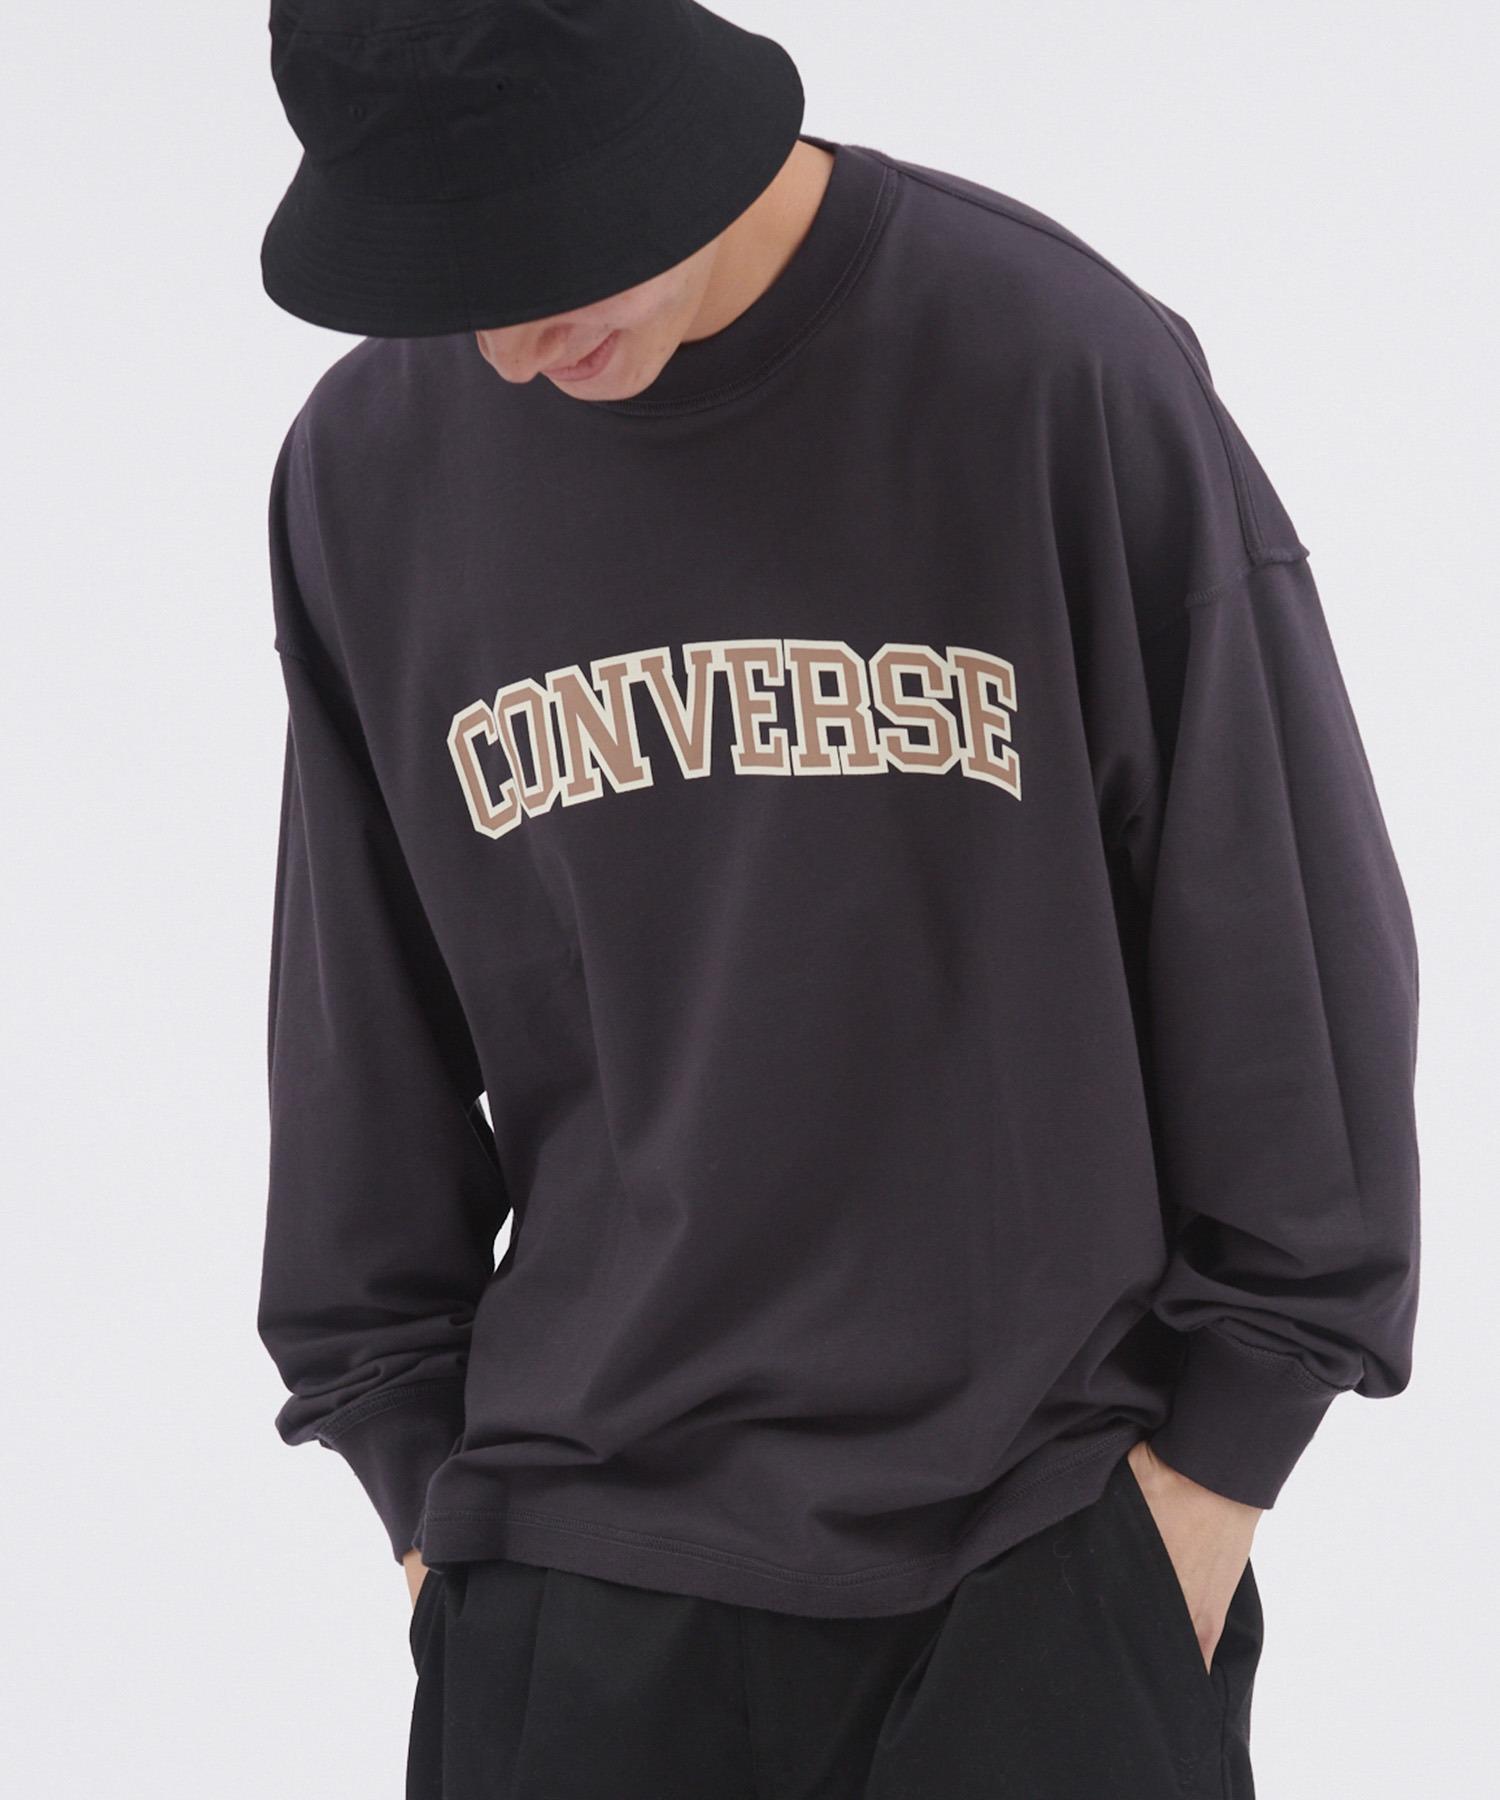 CONVERSE/コンバース オーバーサイズリバーシブル長袖カットソー